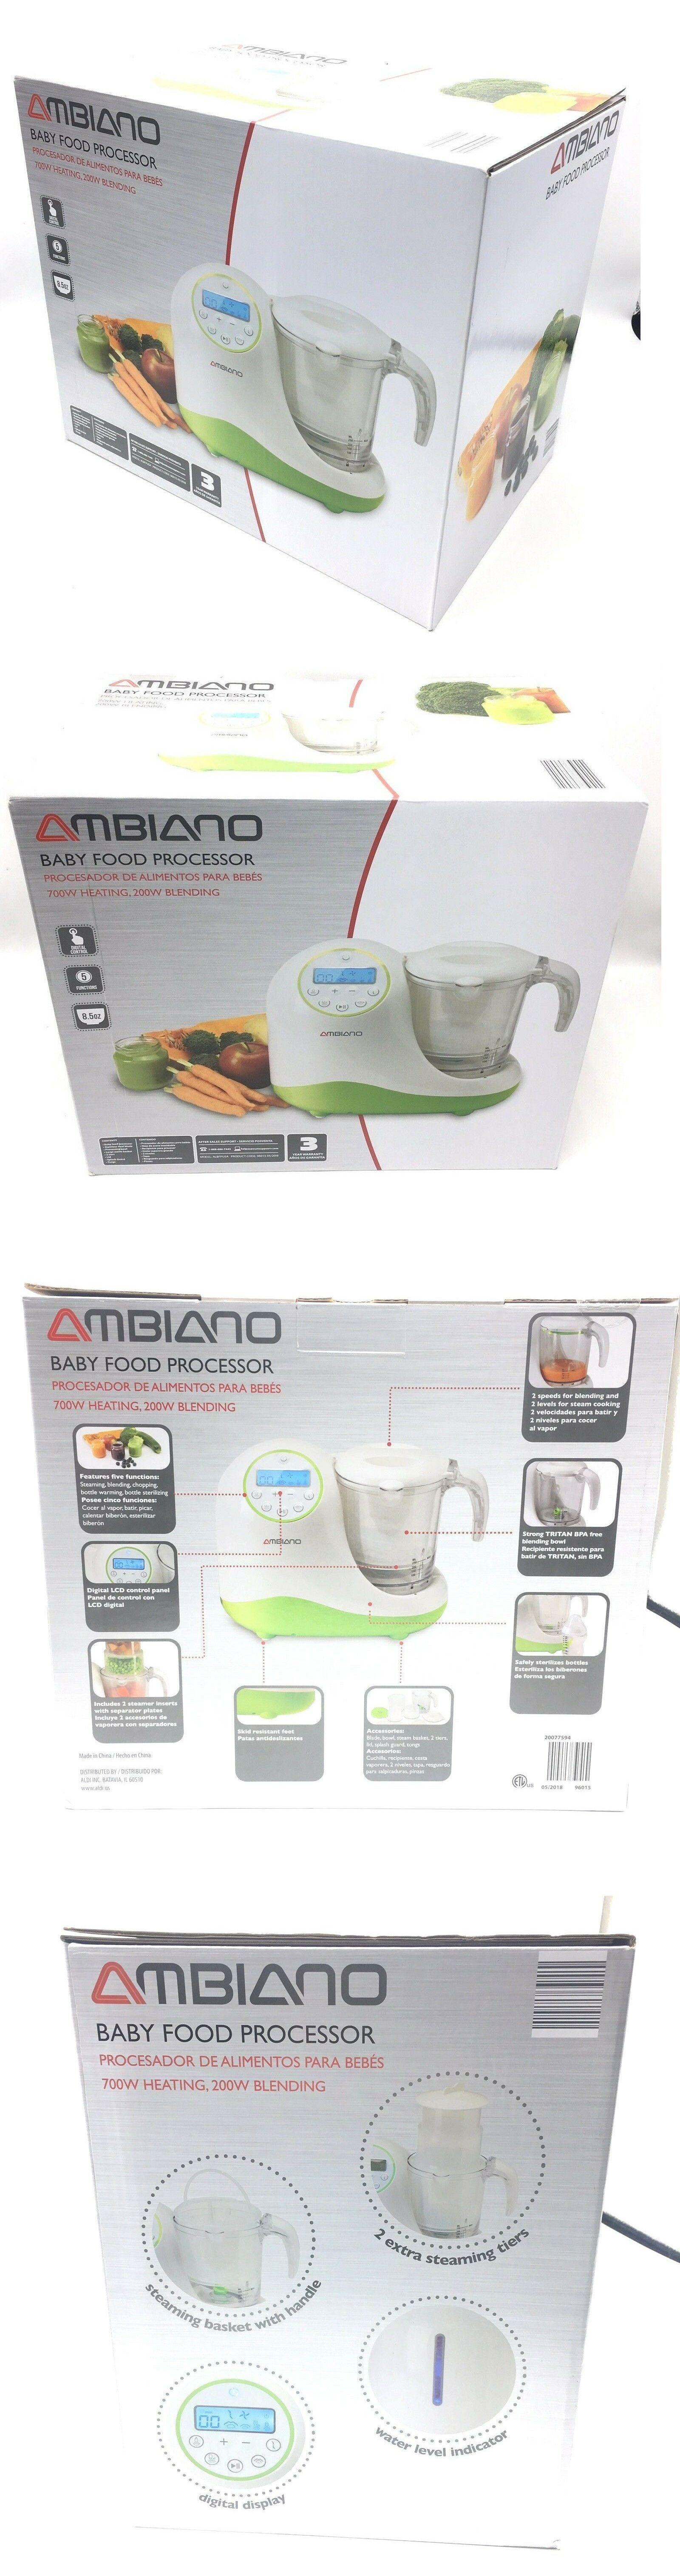 Food Grinders and Blenders 32866: Ambiano Baby Food